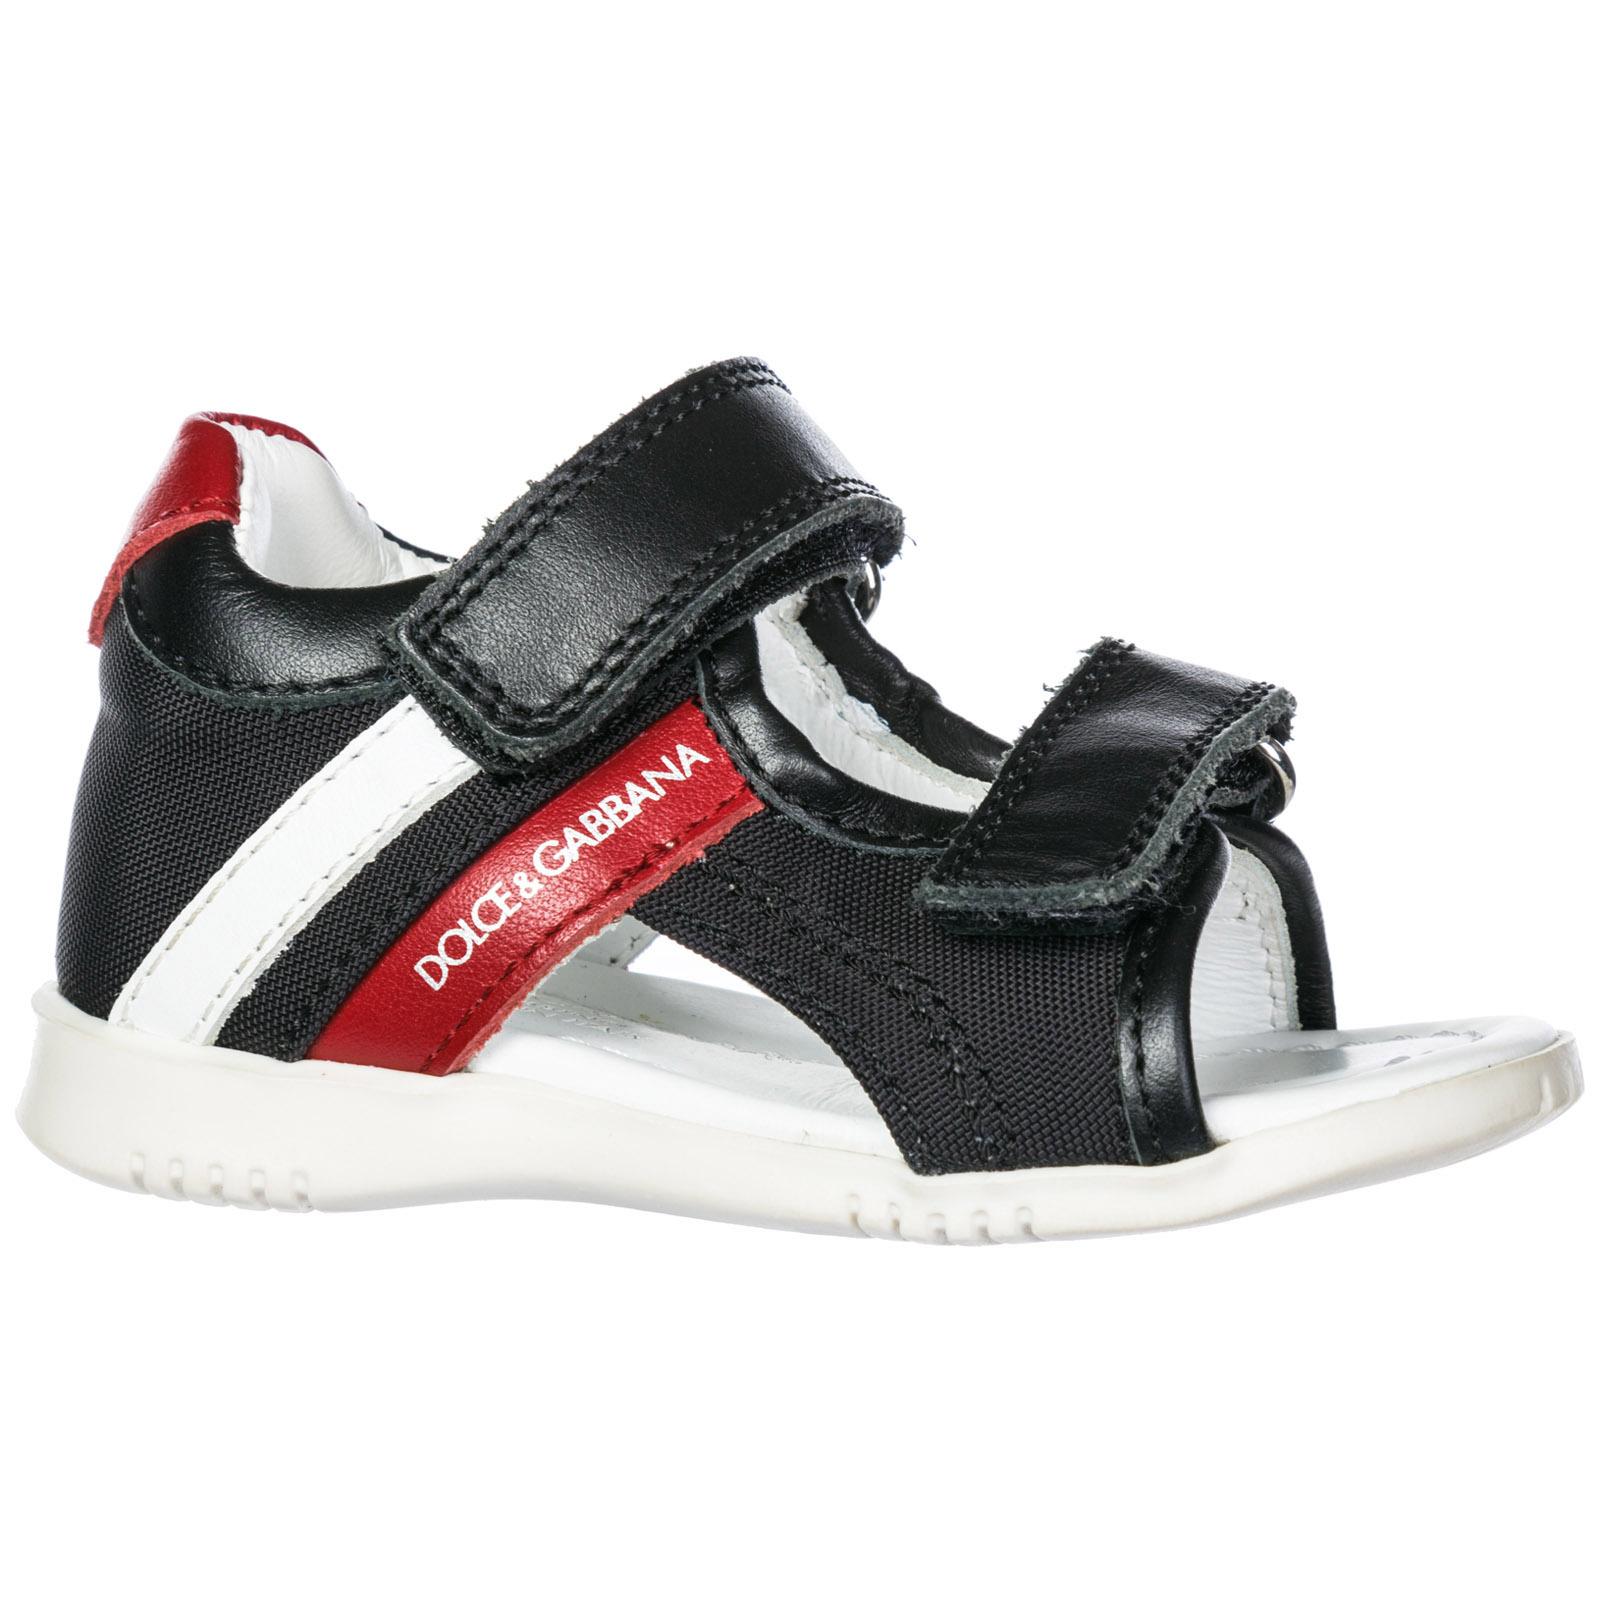 Sandali Dolce Gabbana DN0039AL6808T954 nero   rosso   bianco ... 59d0d5a07a8